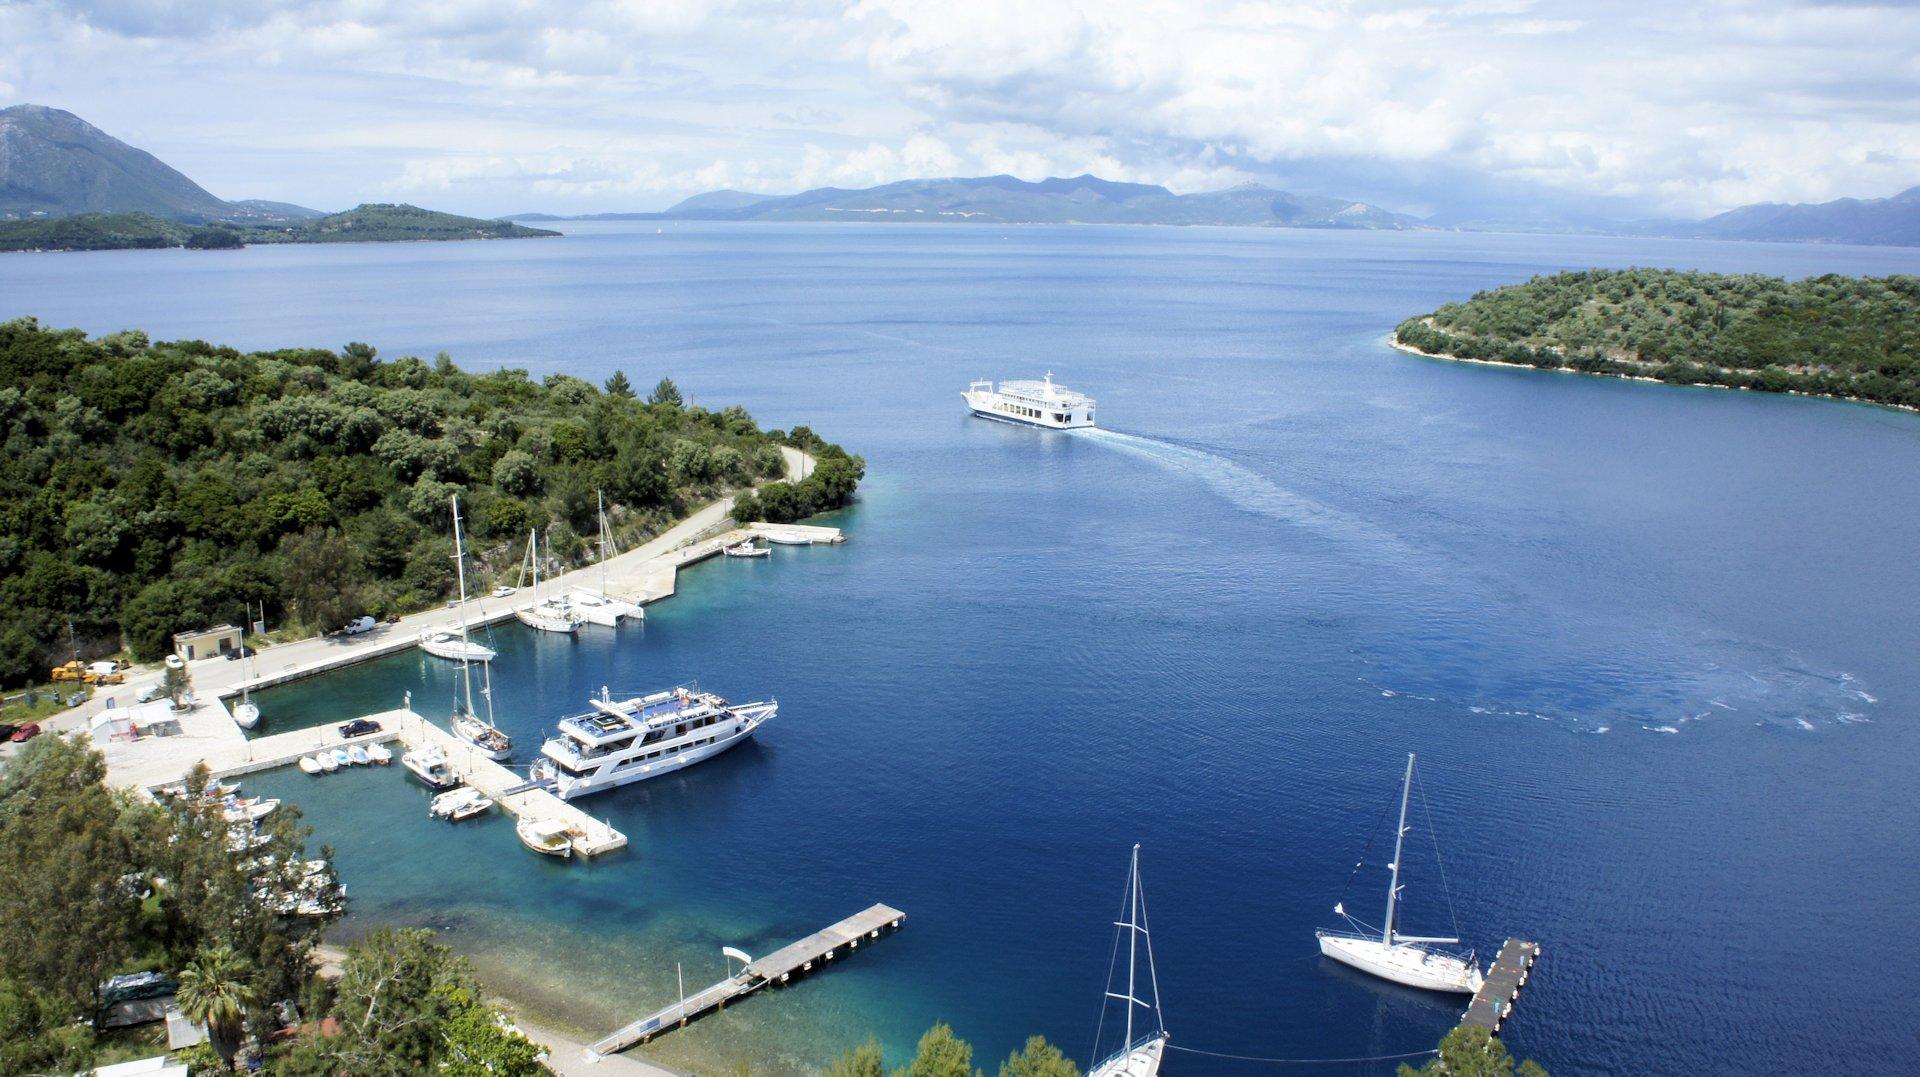 Noleggio Barche Isola di Meganissi - Navalia | Noleggia un Sogno